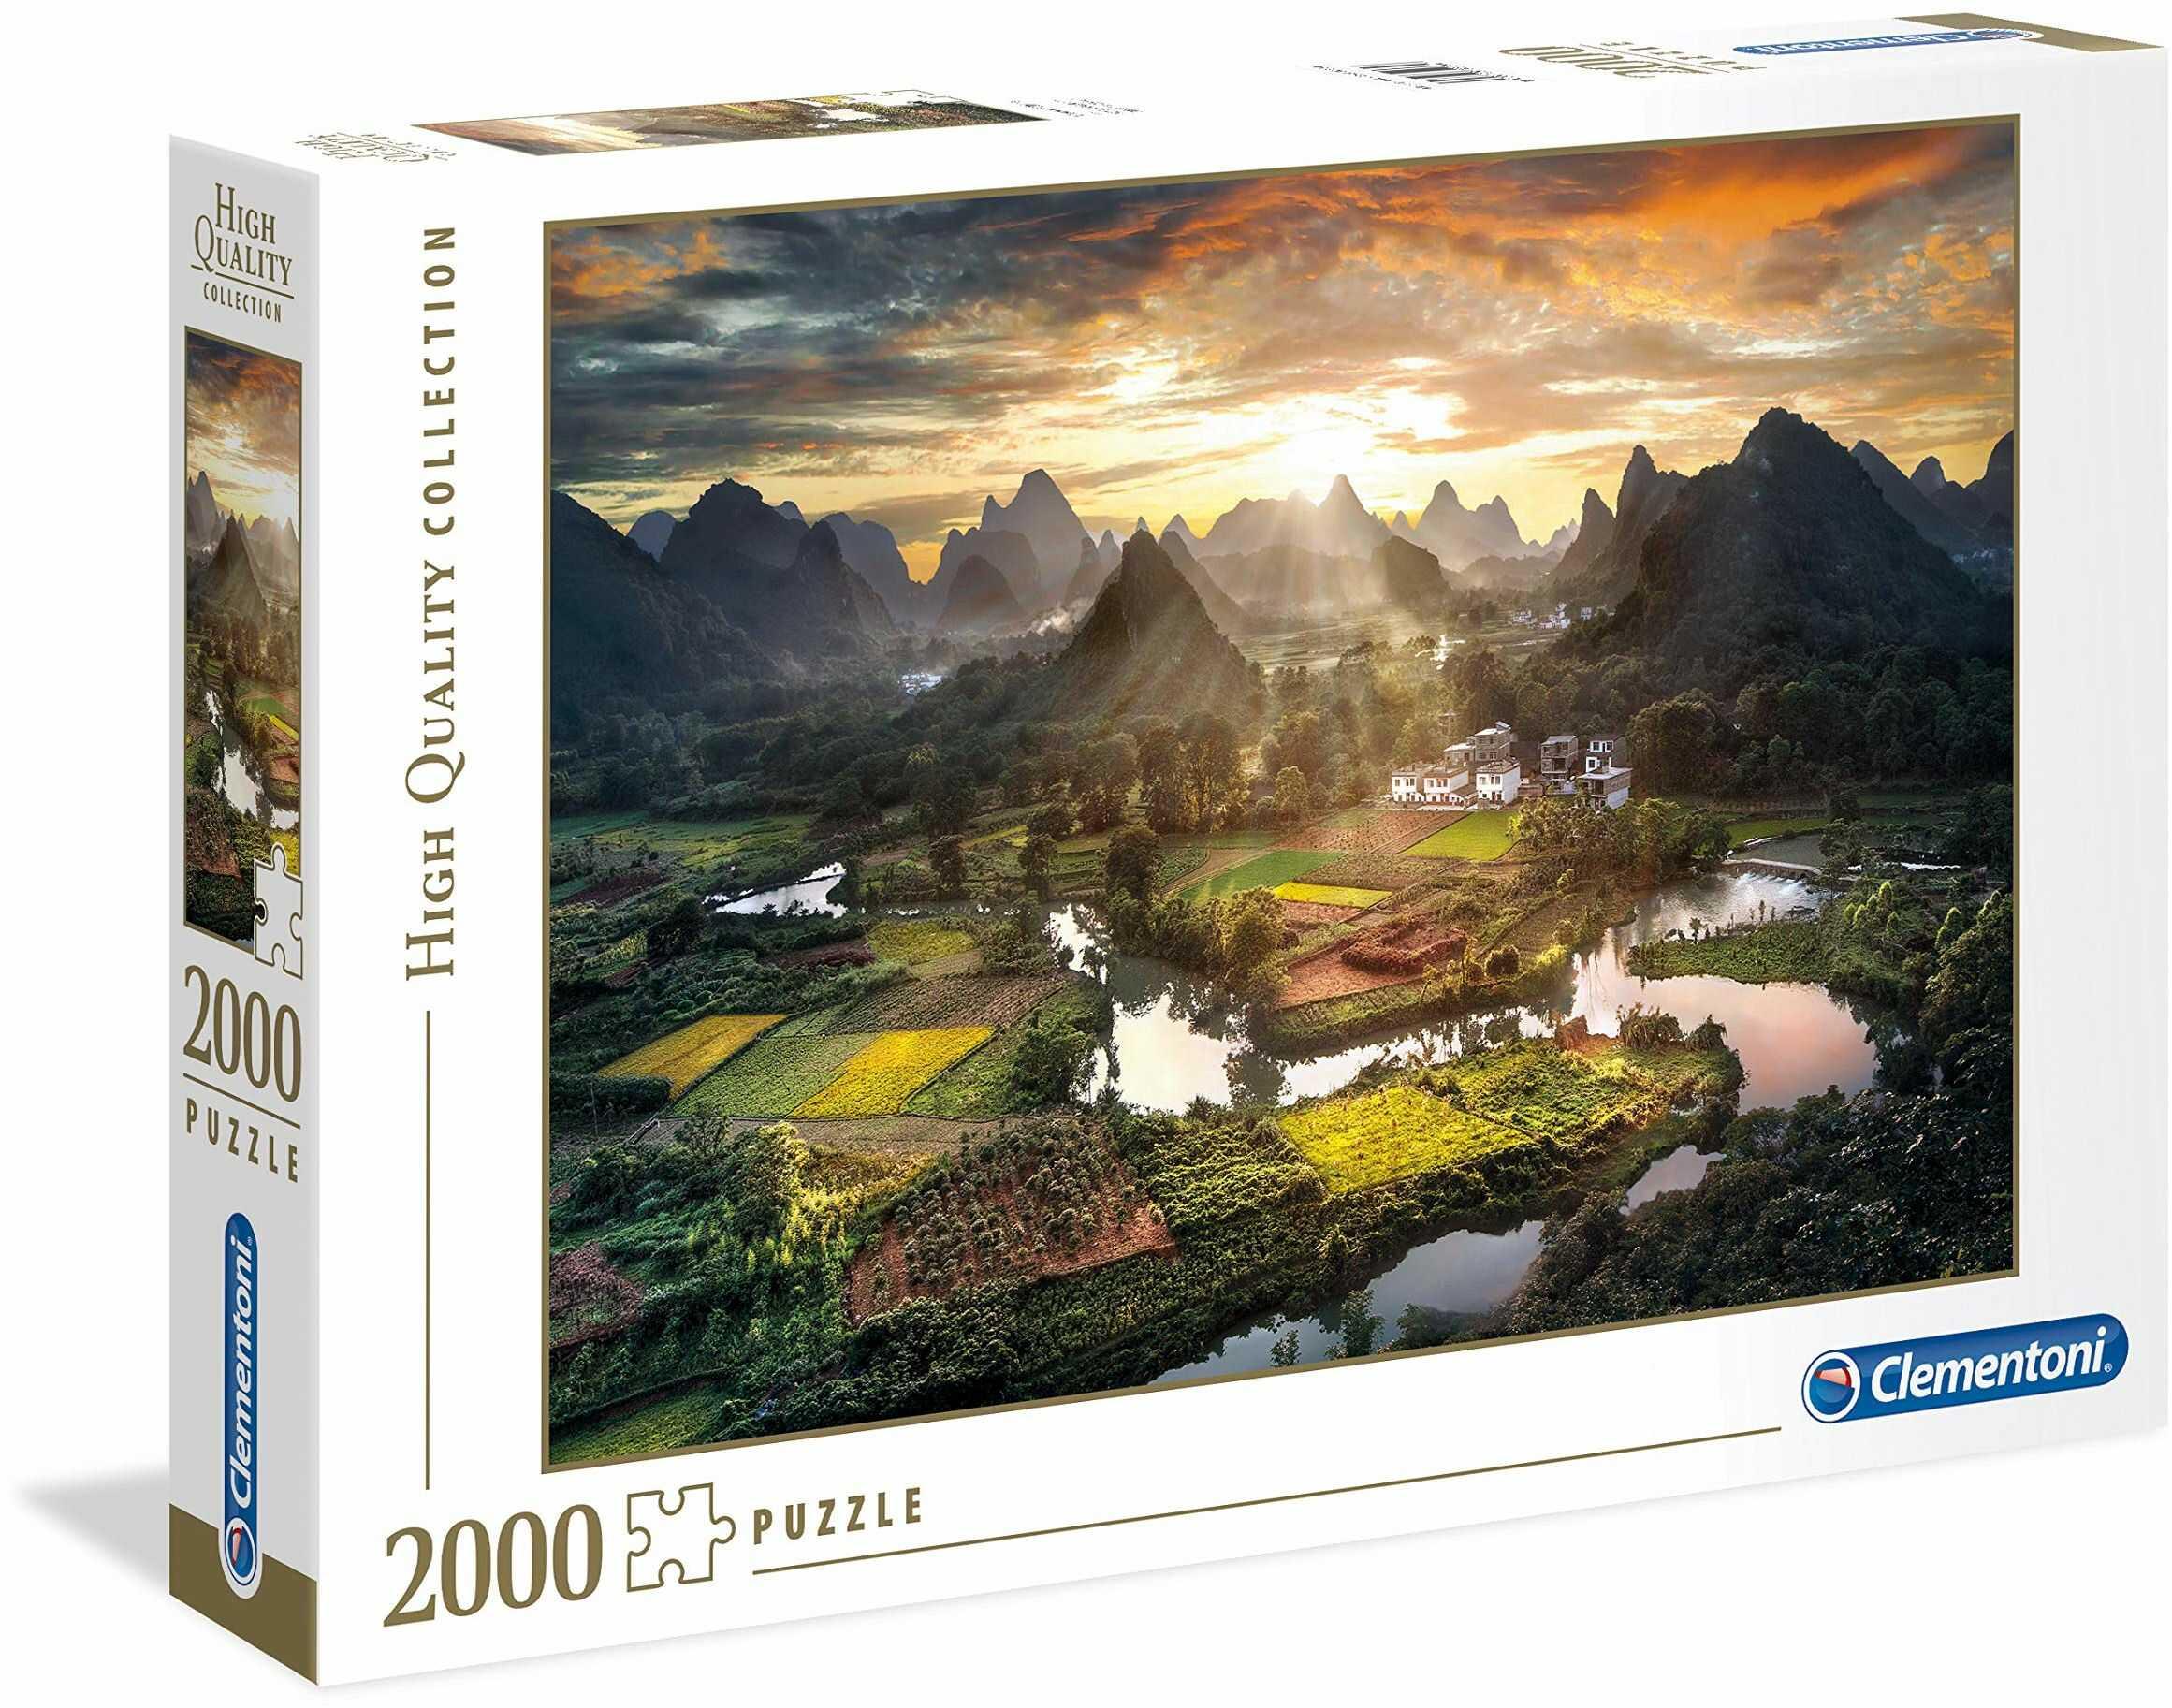 "Clementoni 32564"" Tal in Chin-Puzzle 2000 części High Quality Collection"